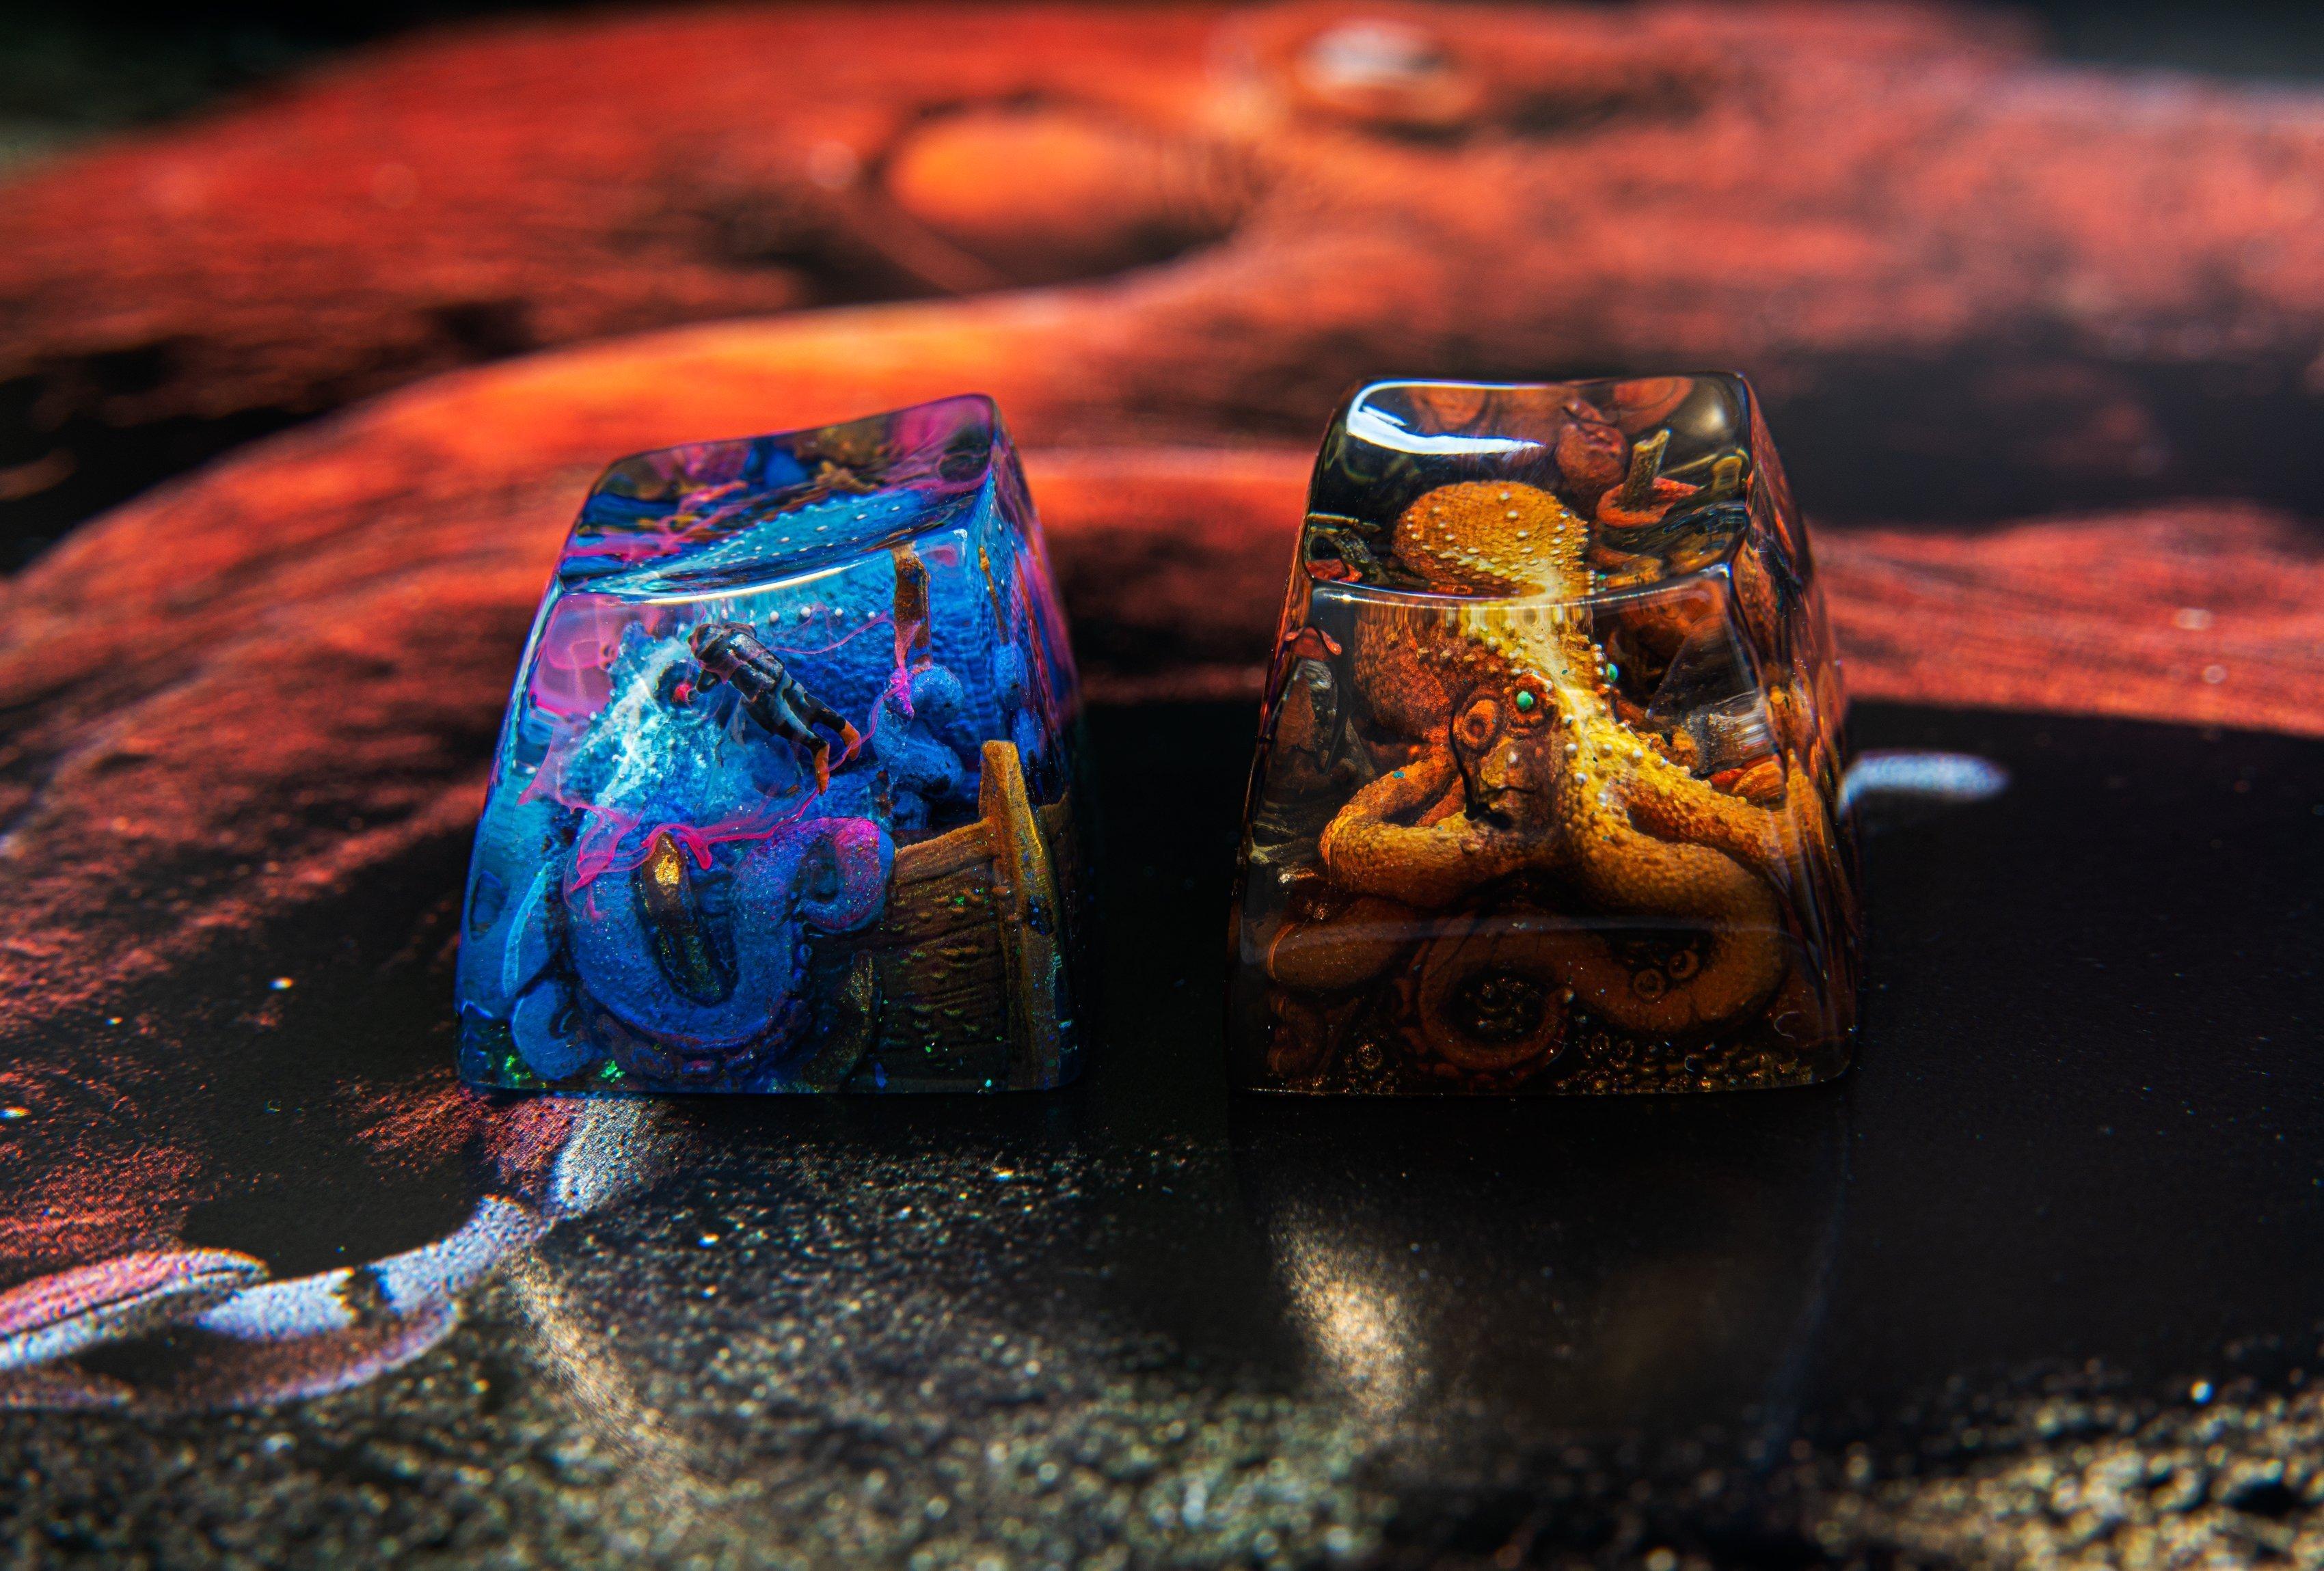 dwarf factory kraken keycaps